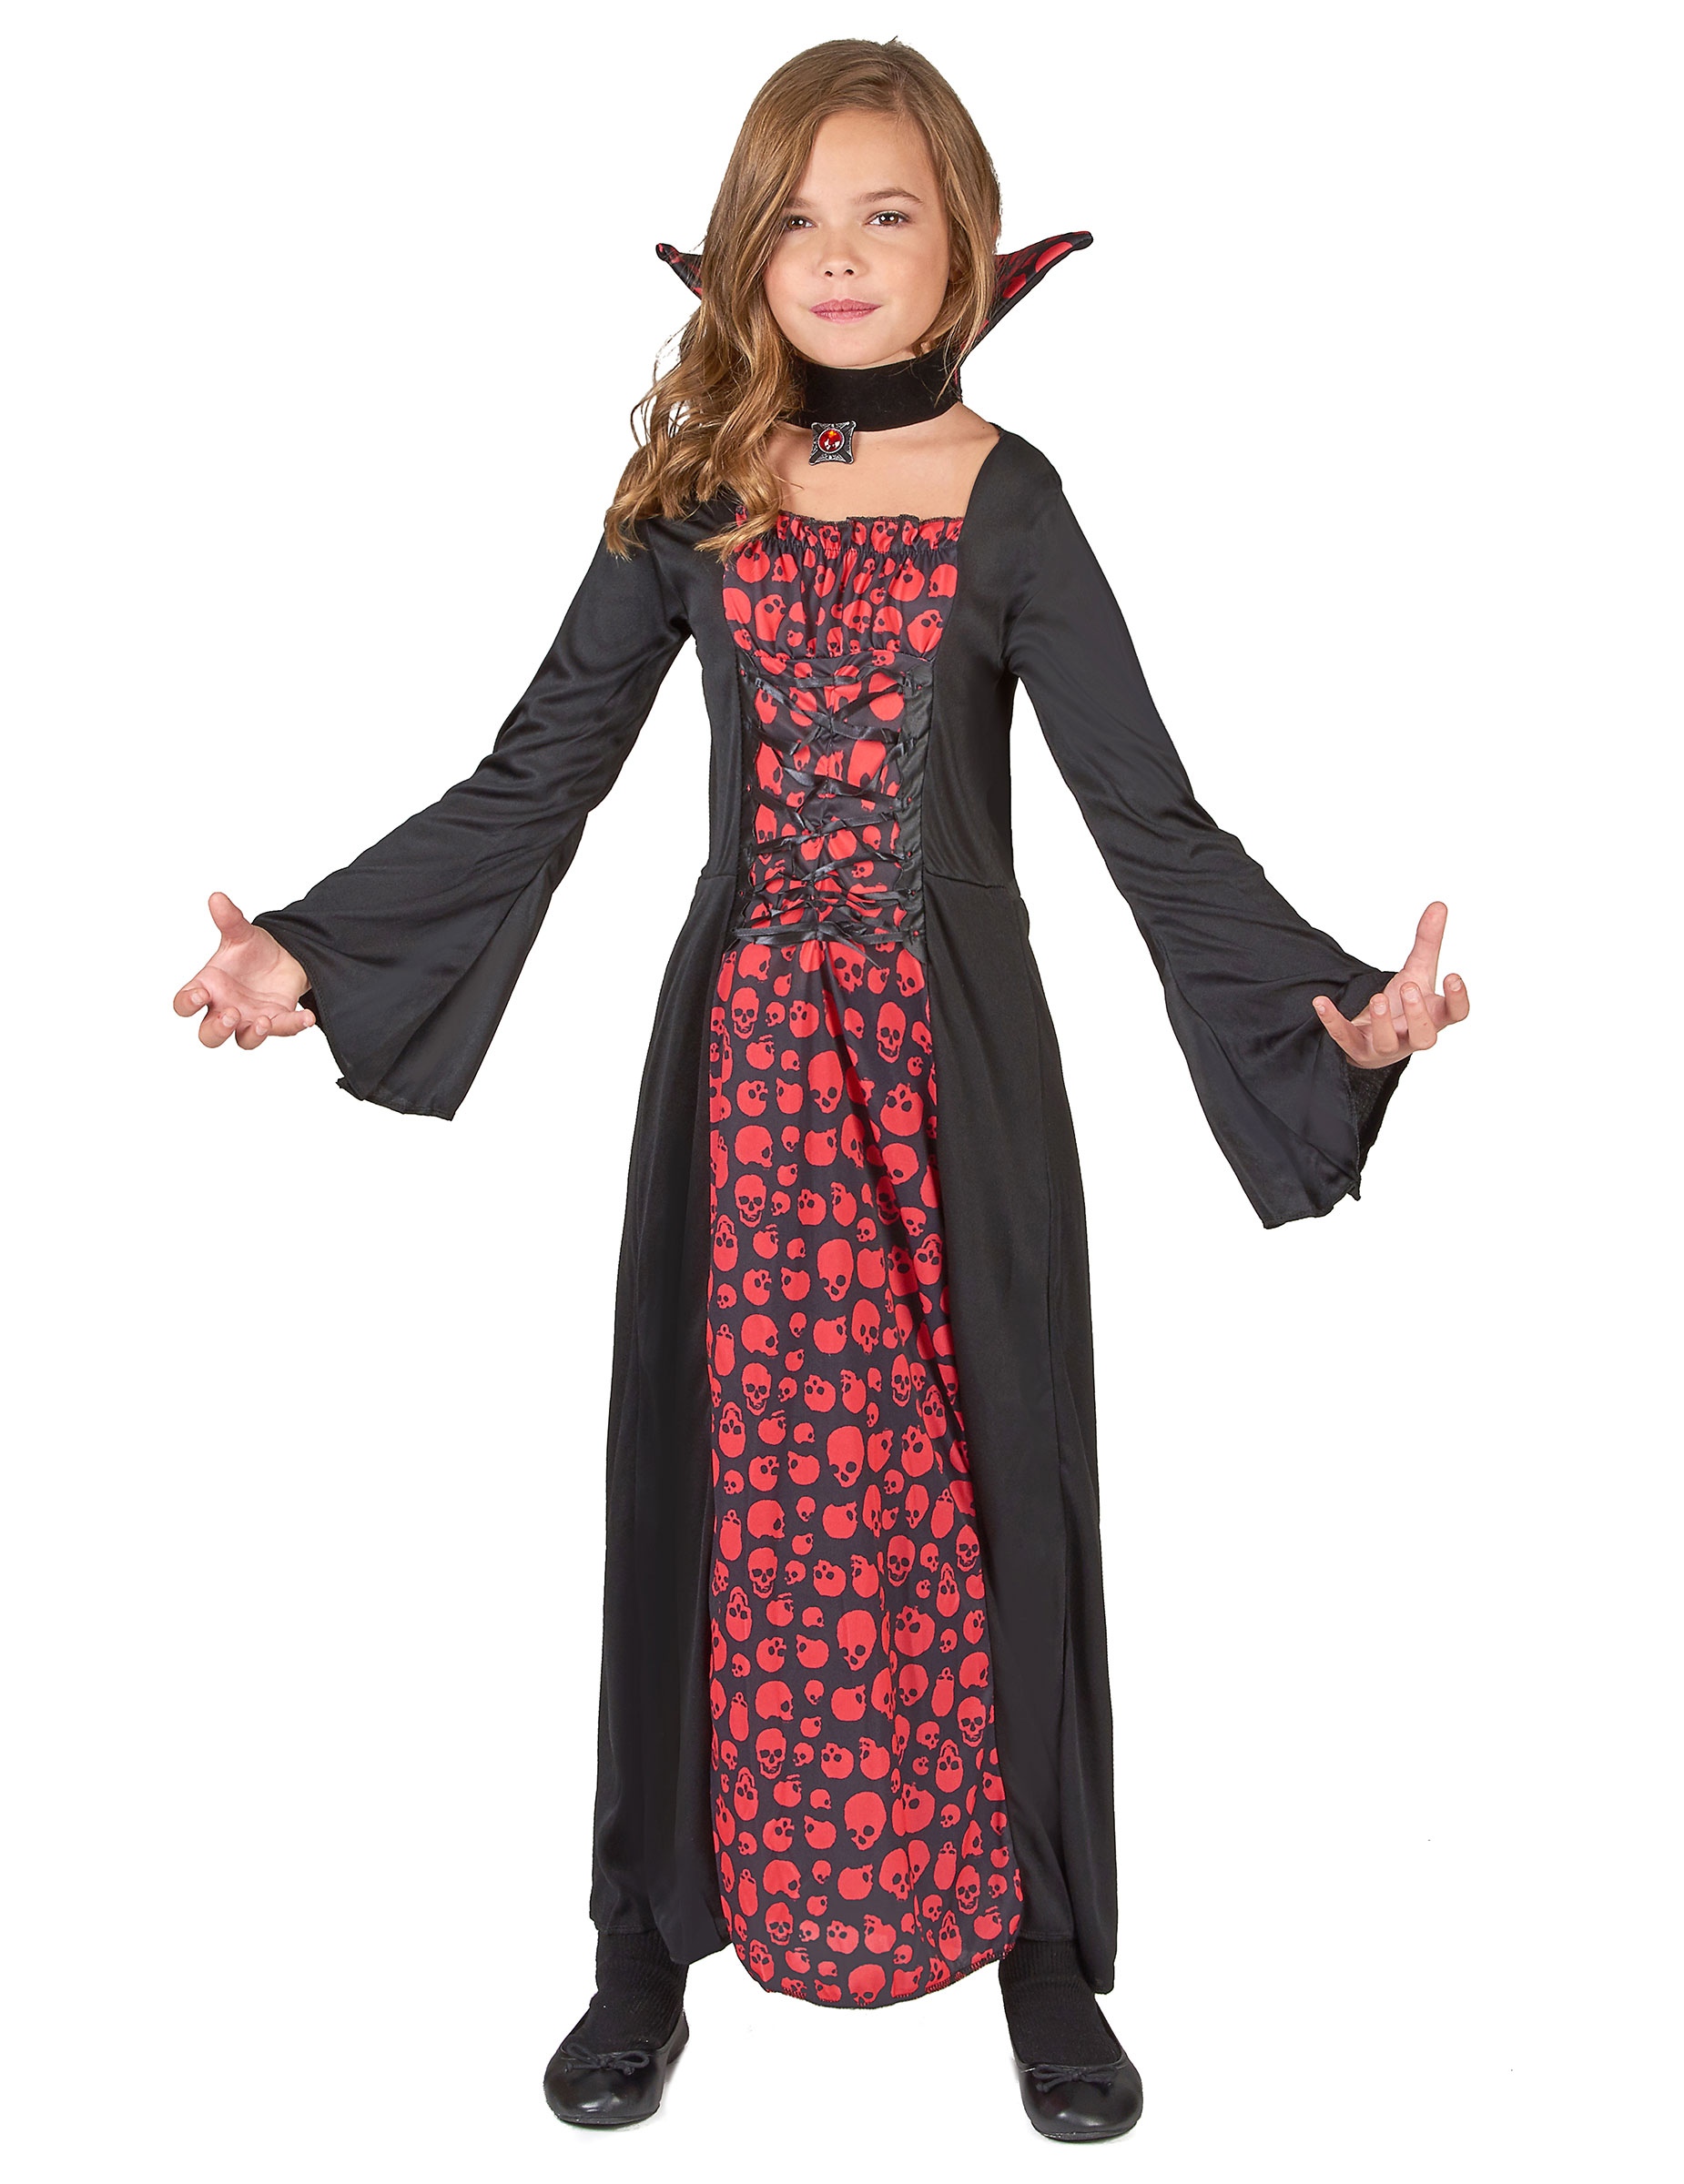 elegante vampirin kinderkost m rot schwarz g nstige faschings kost me bei karneval megastore. Black Bedroom Furniture Sets. Home Design Ideas